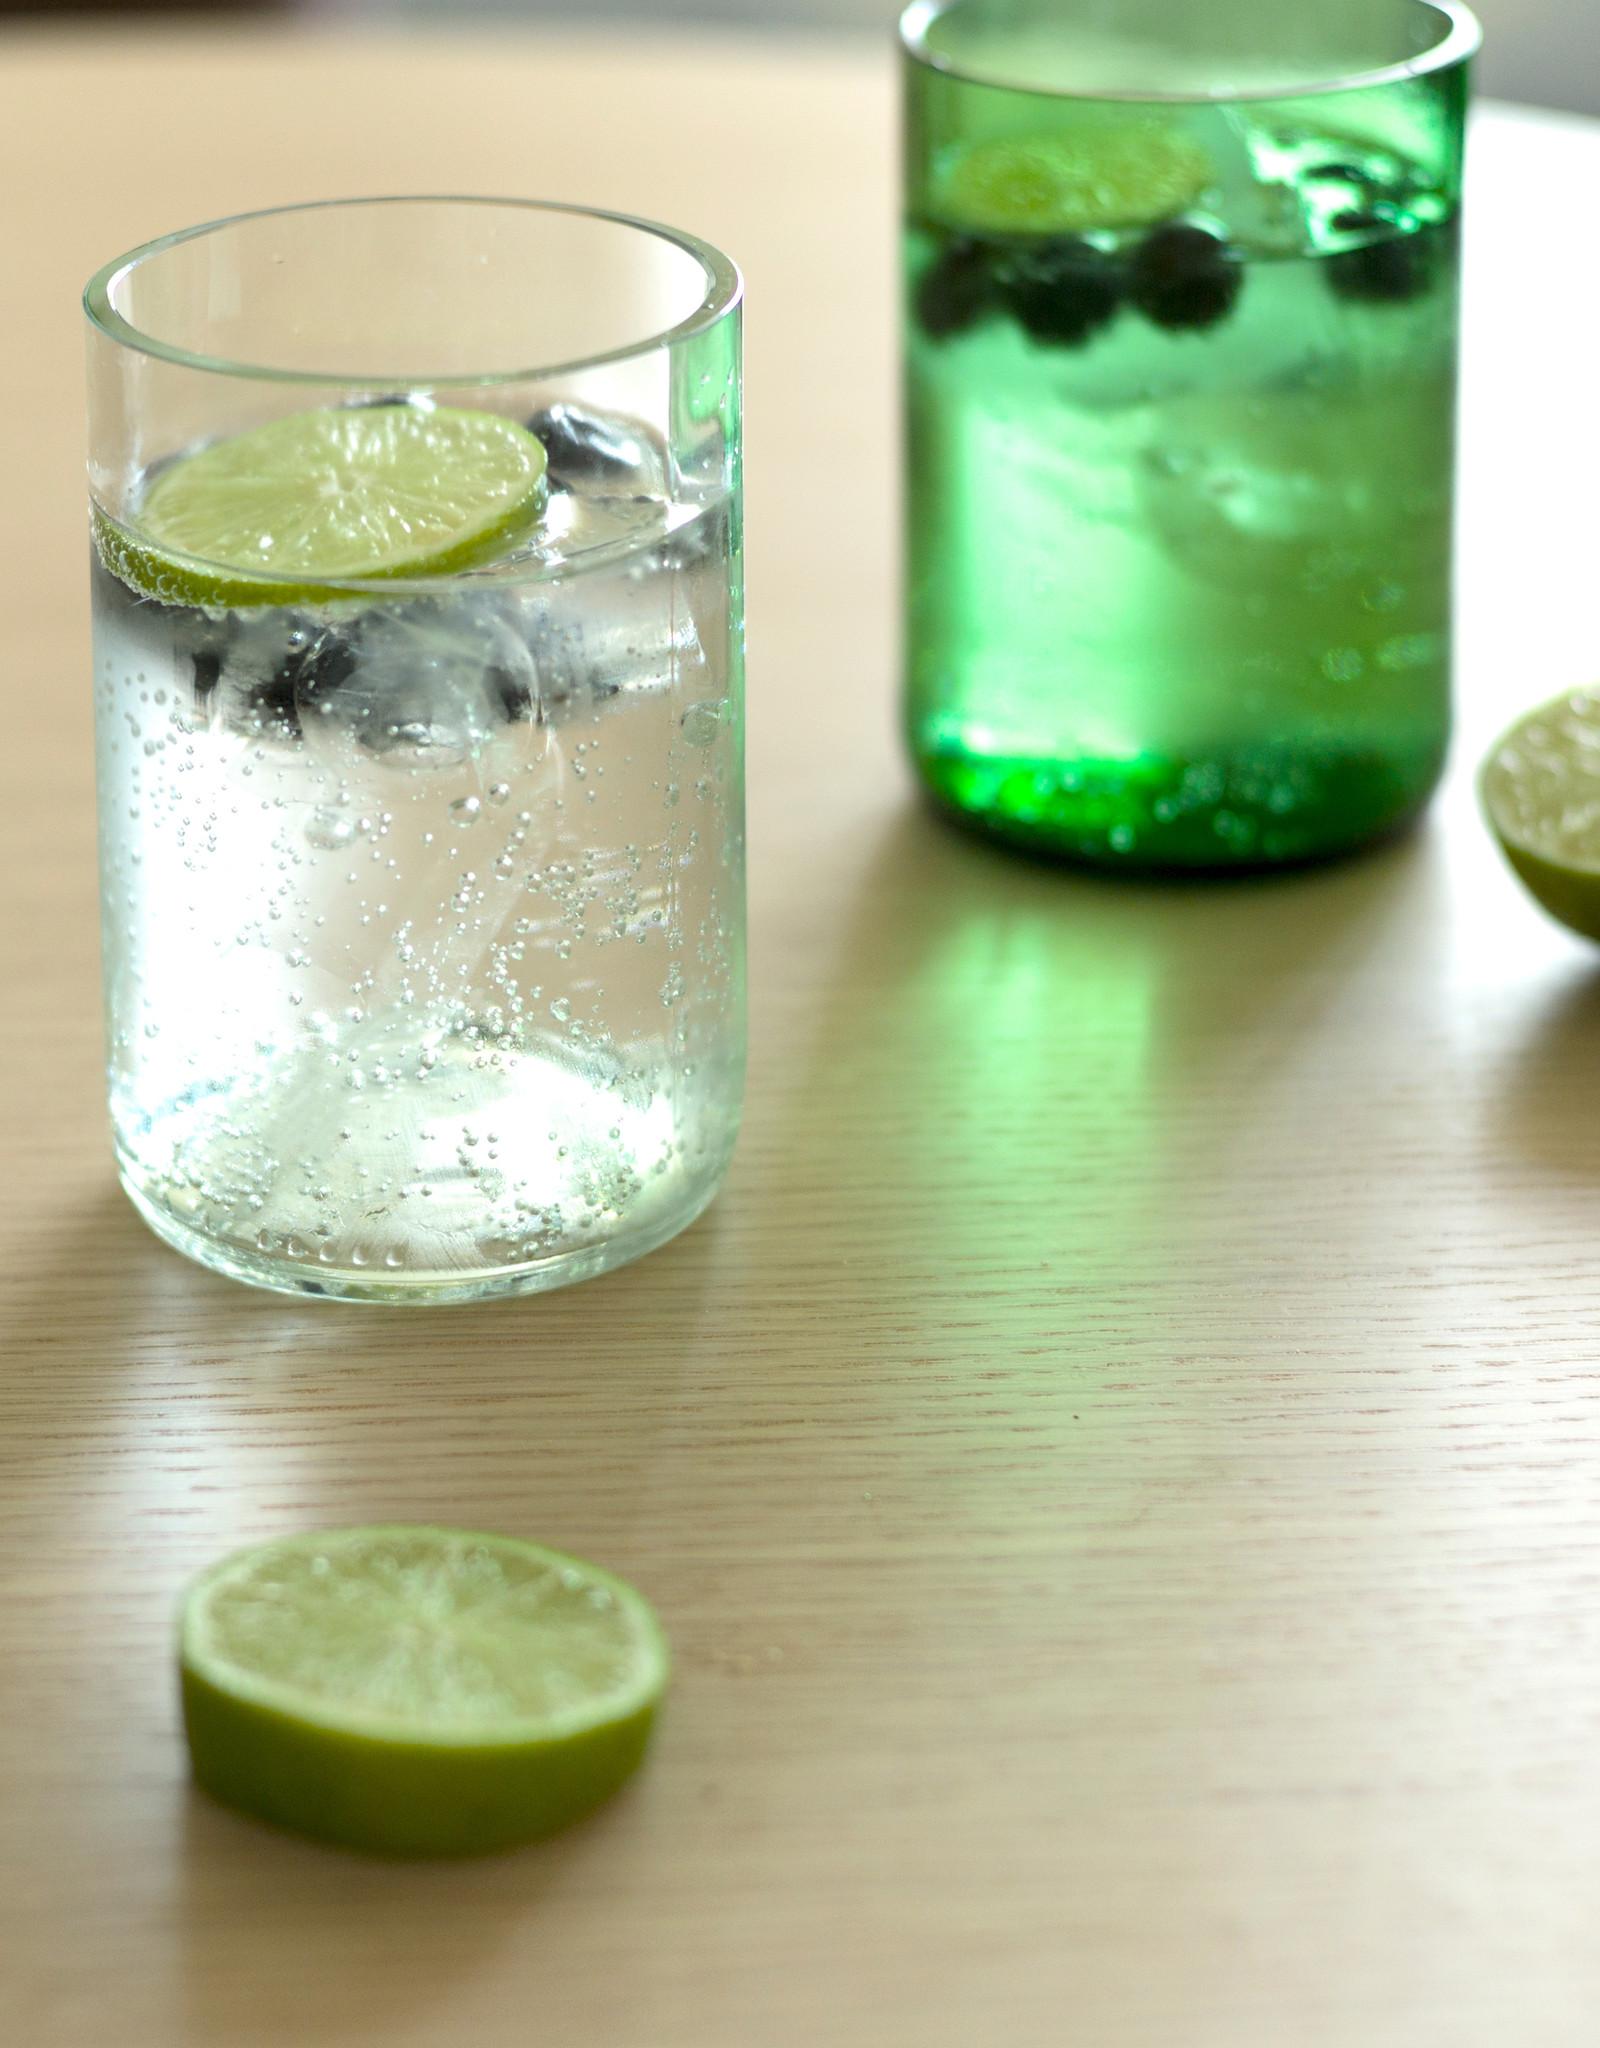 Rebottled Upcycle glas